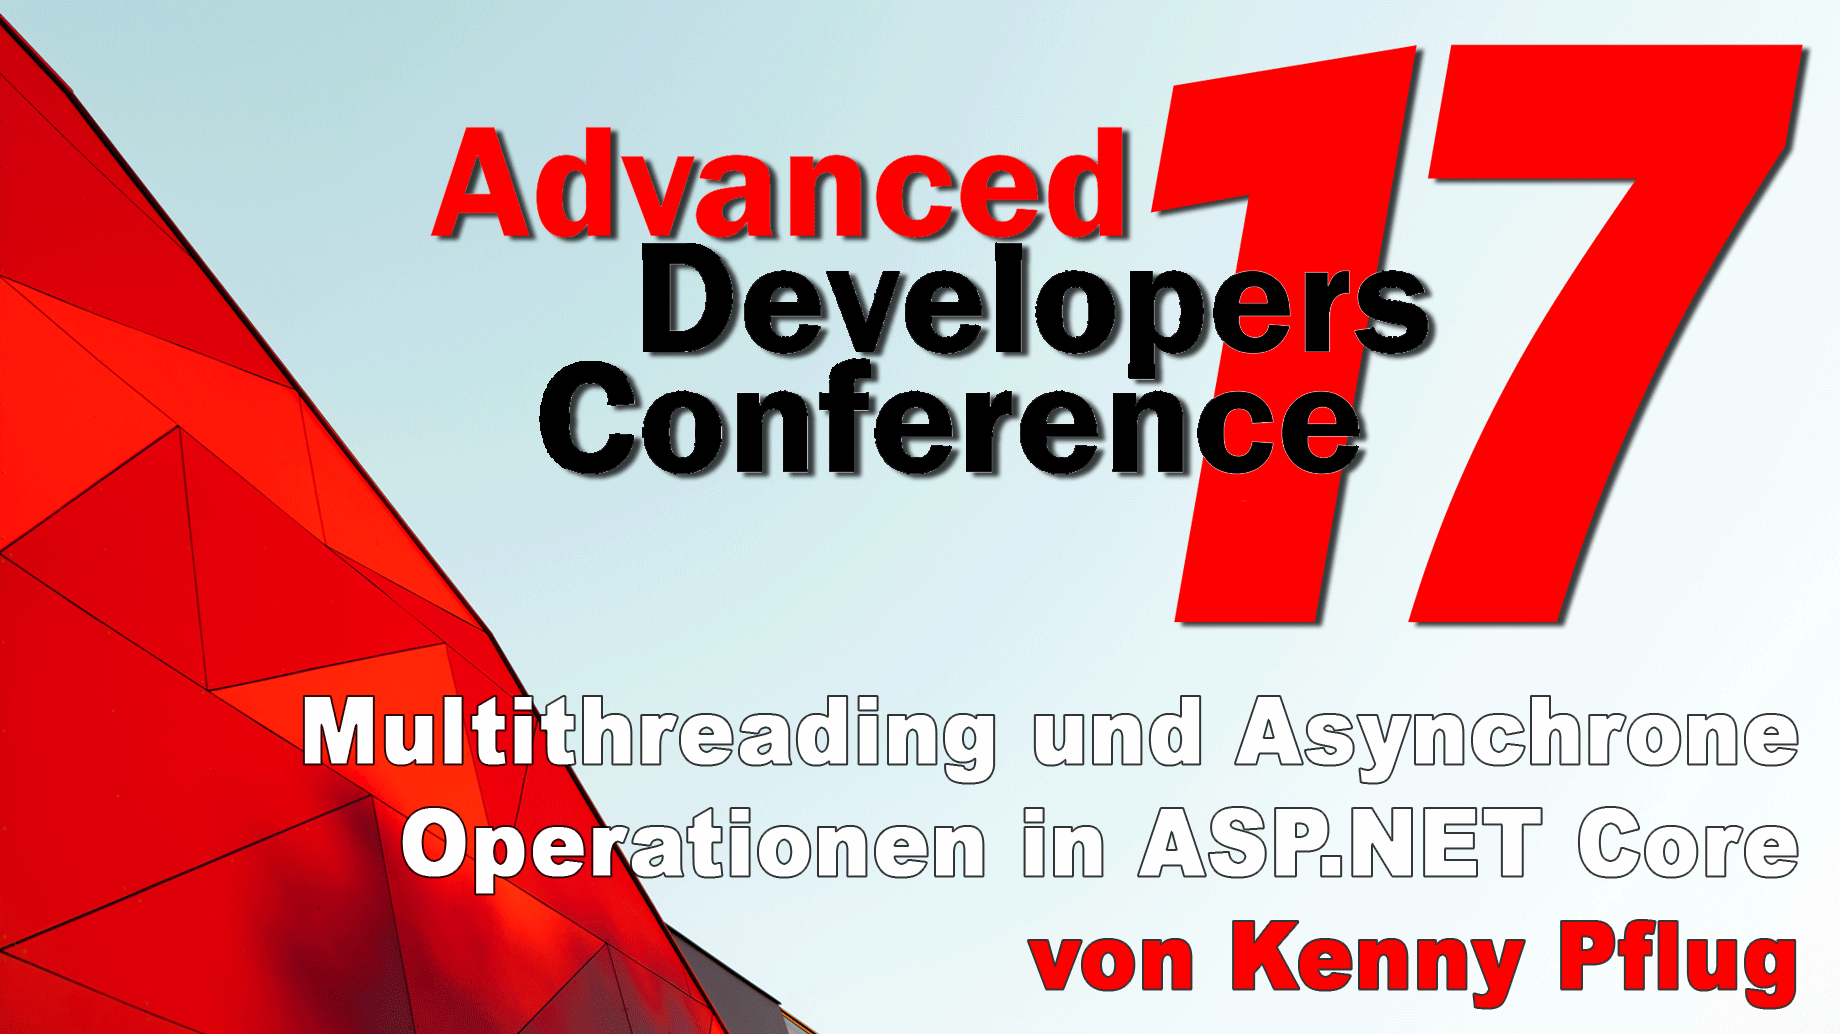 2017/ADCpp/Vortrag4-Multithreading-Asynchrone-Operationen-aspnetcore-KennyPflug